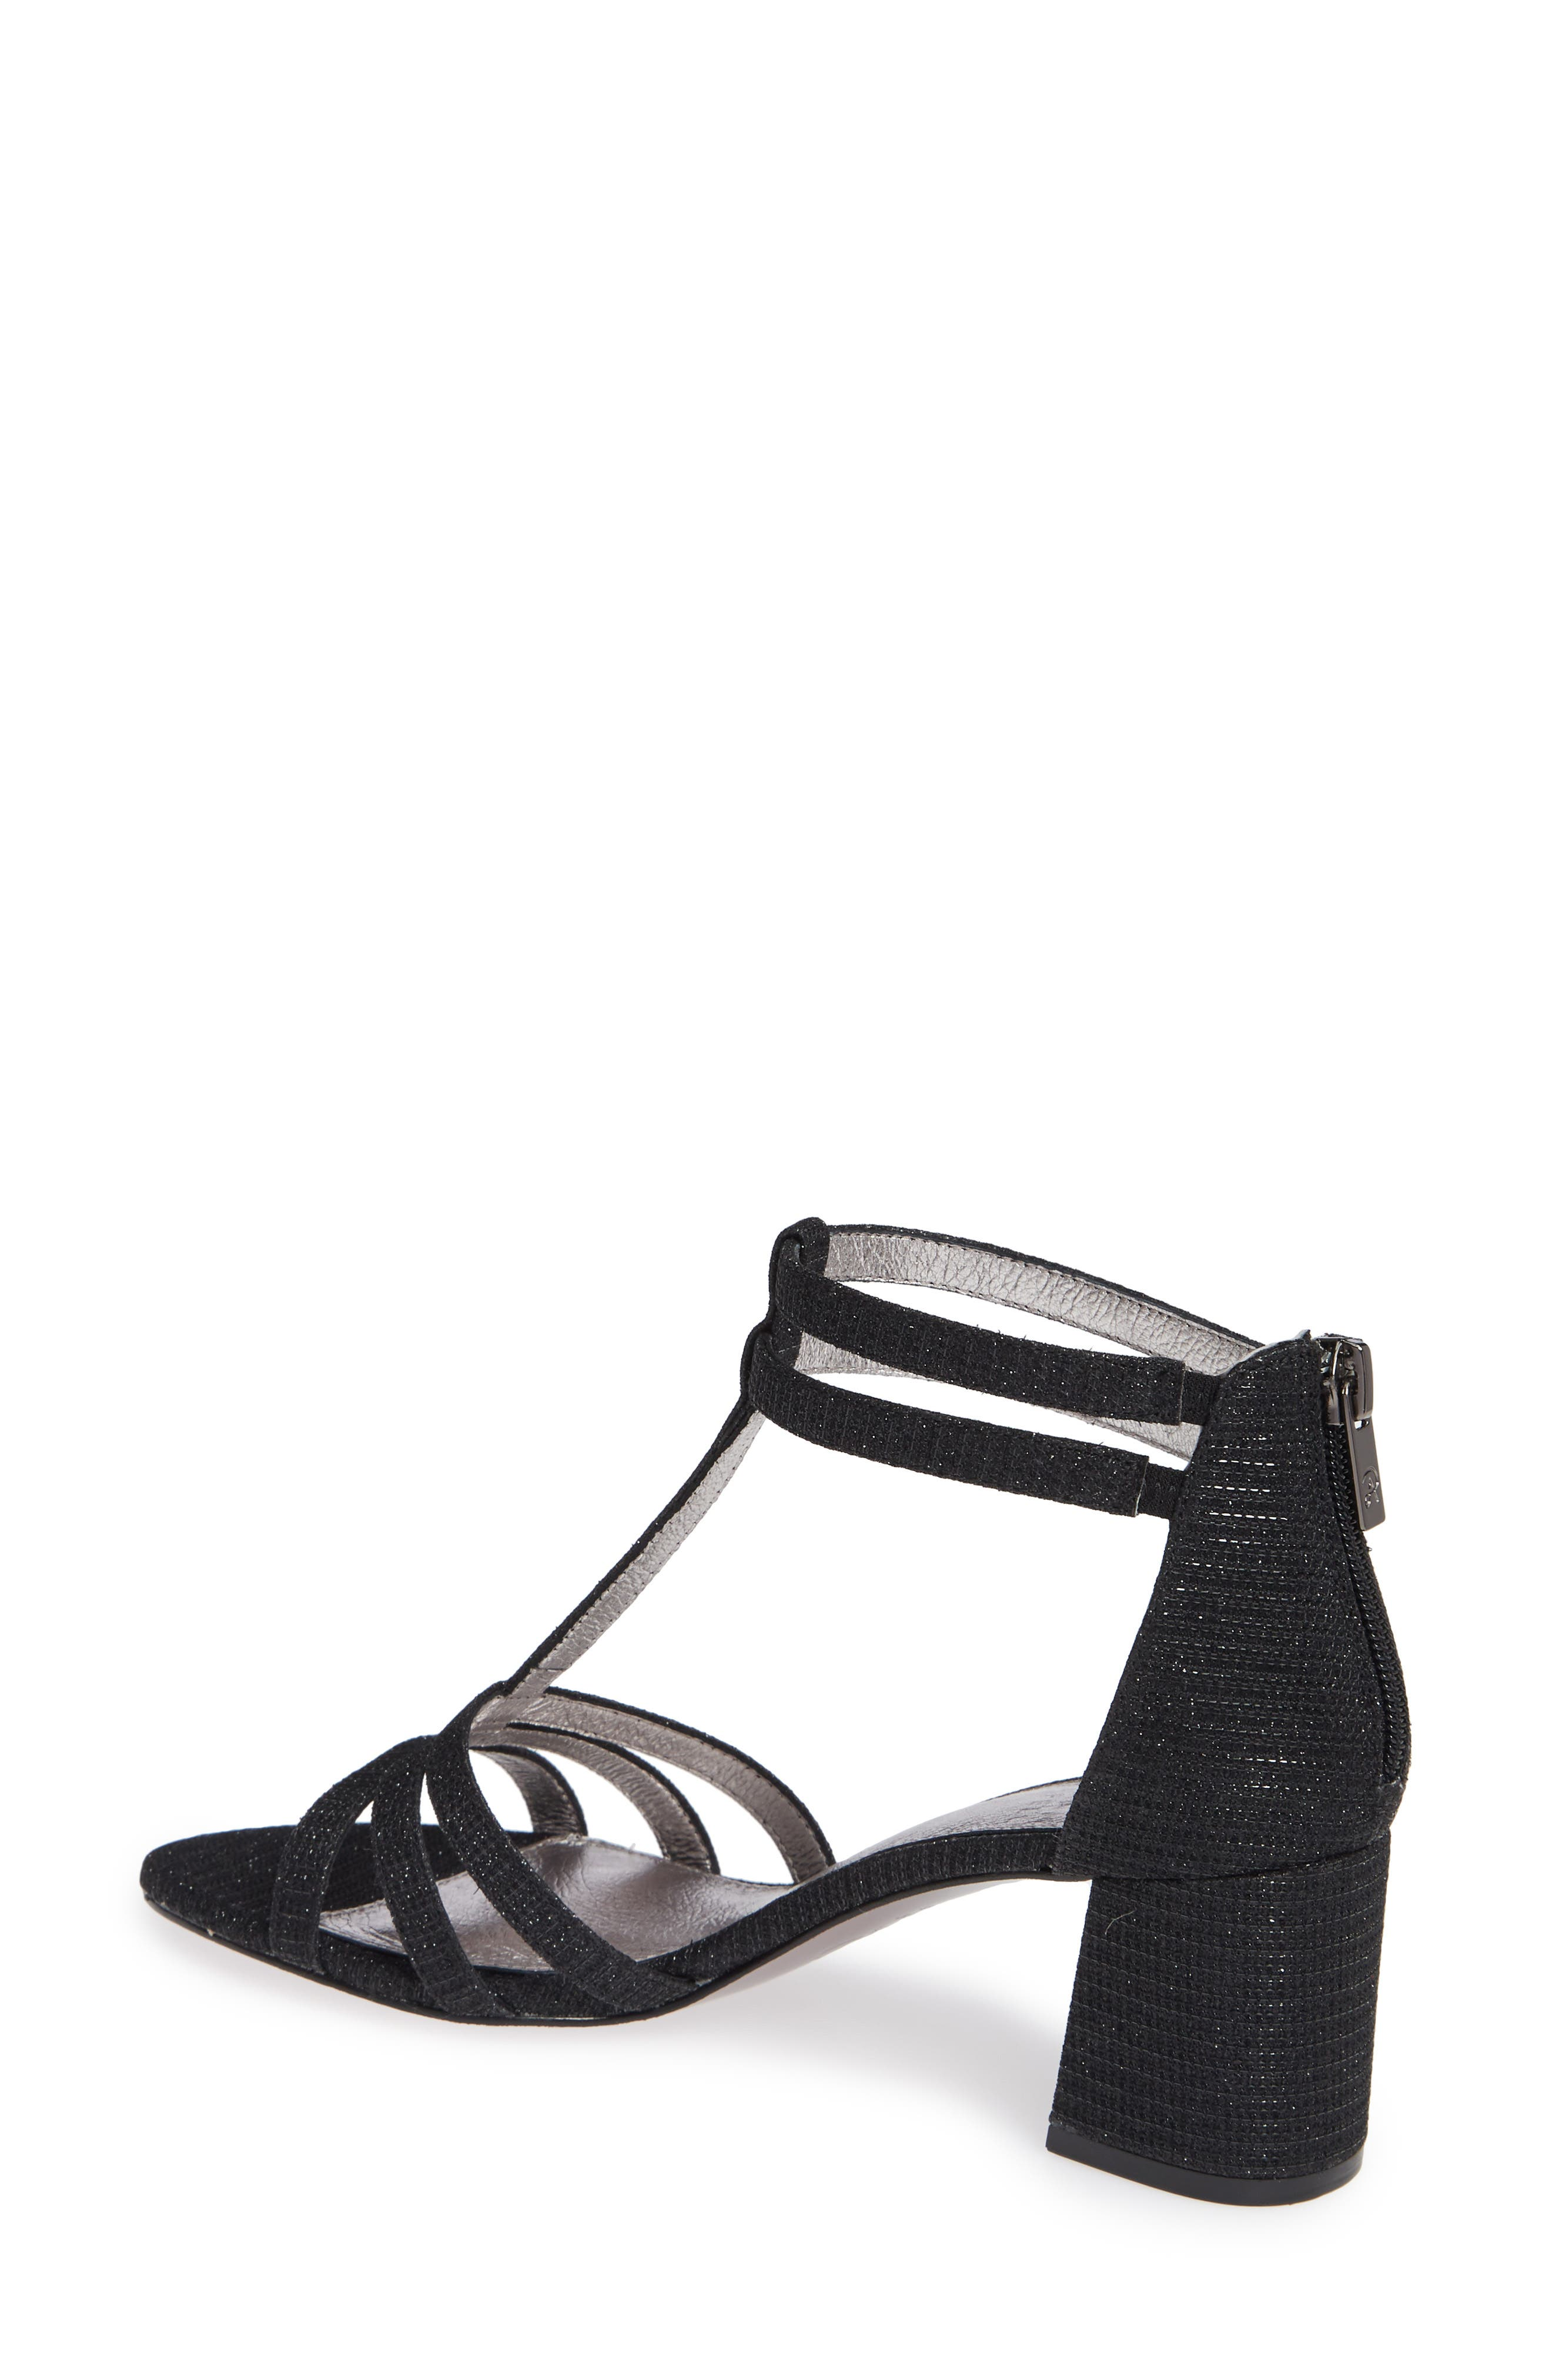 Anella Block Heel Sandal,                             Alternate thumbnail 2, color,                             BLACK GLITTER